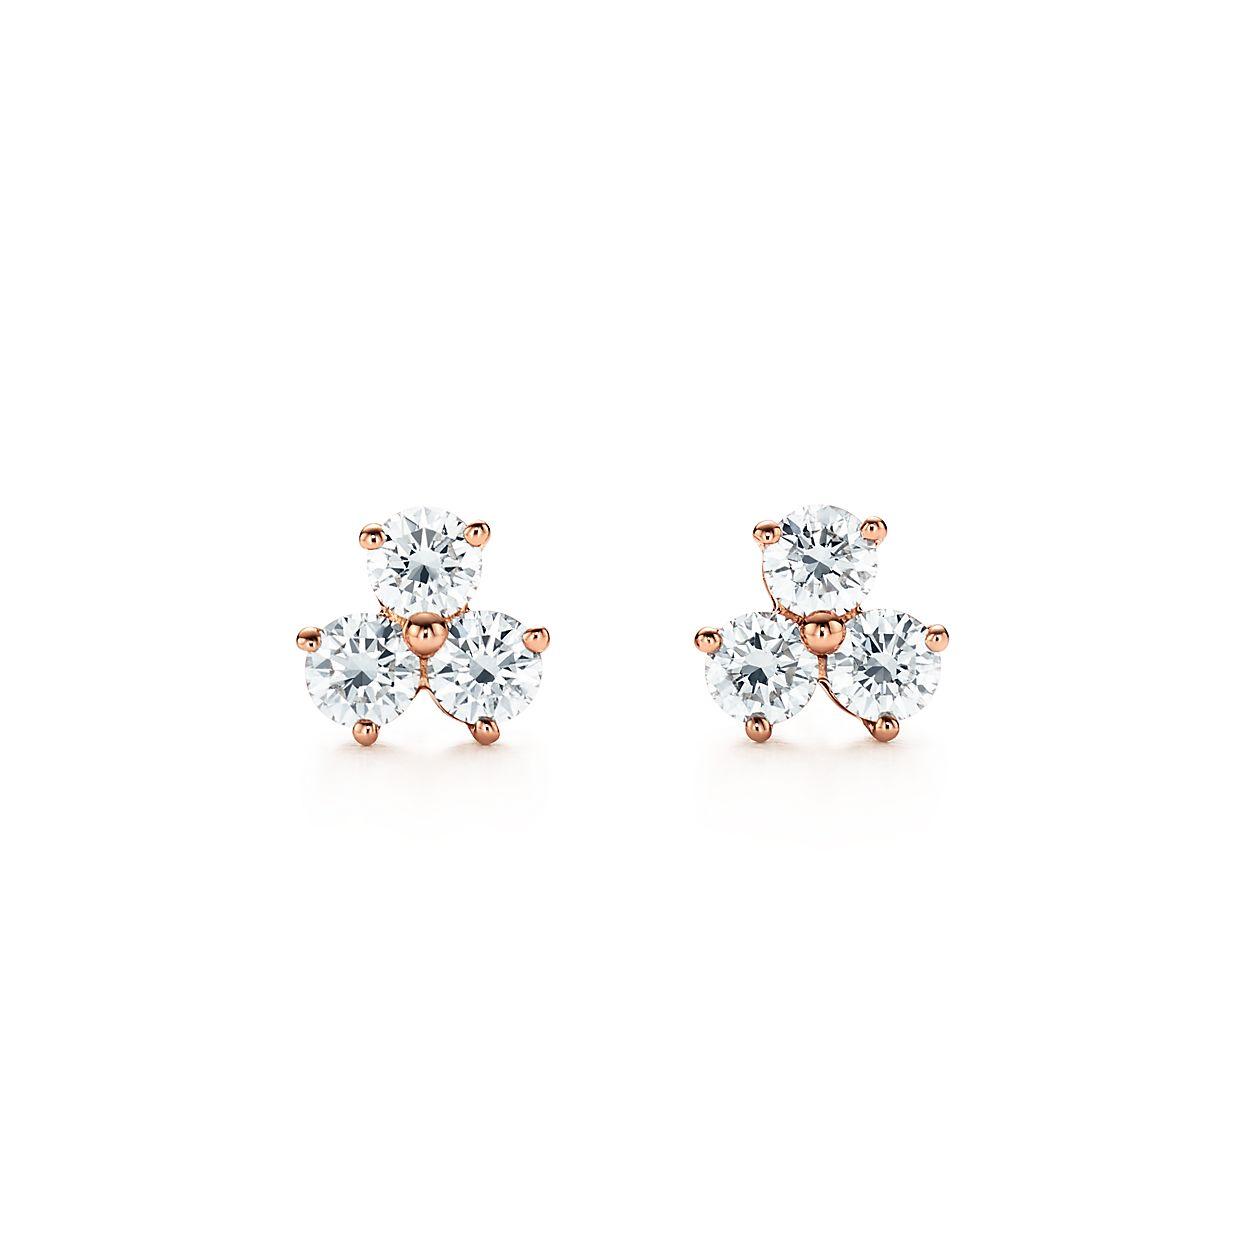 Tiffany Aria Earrings